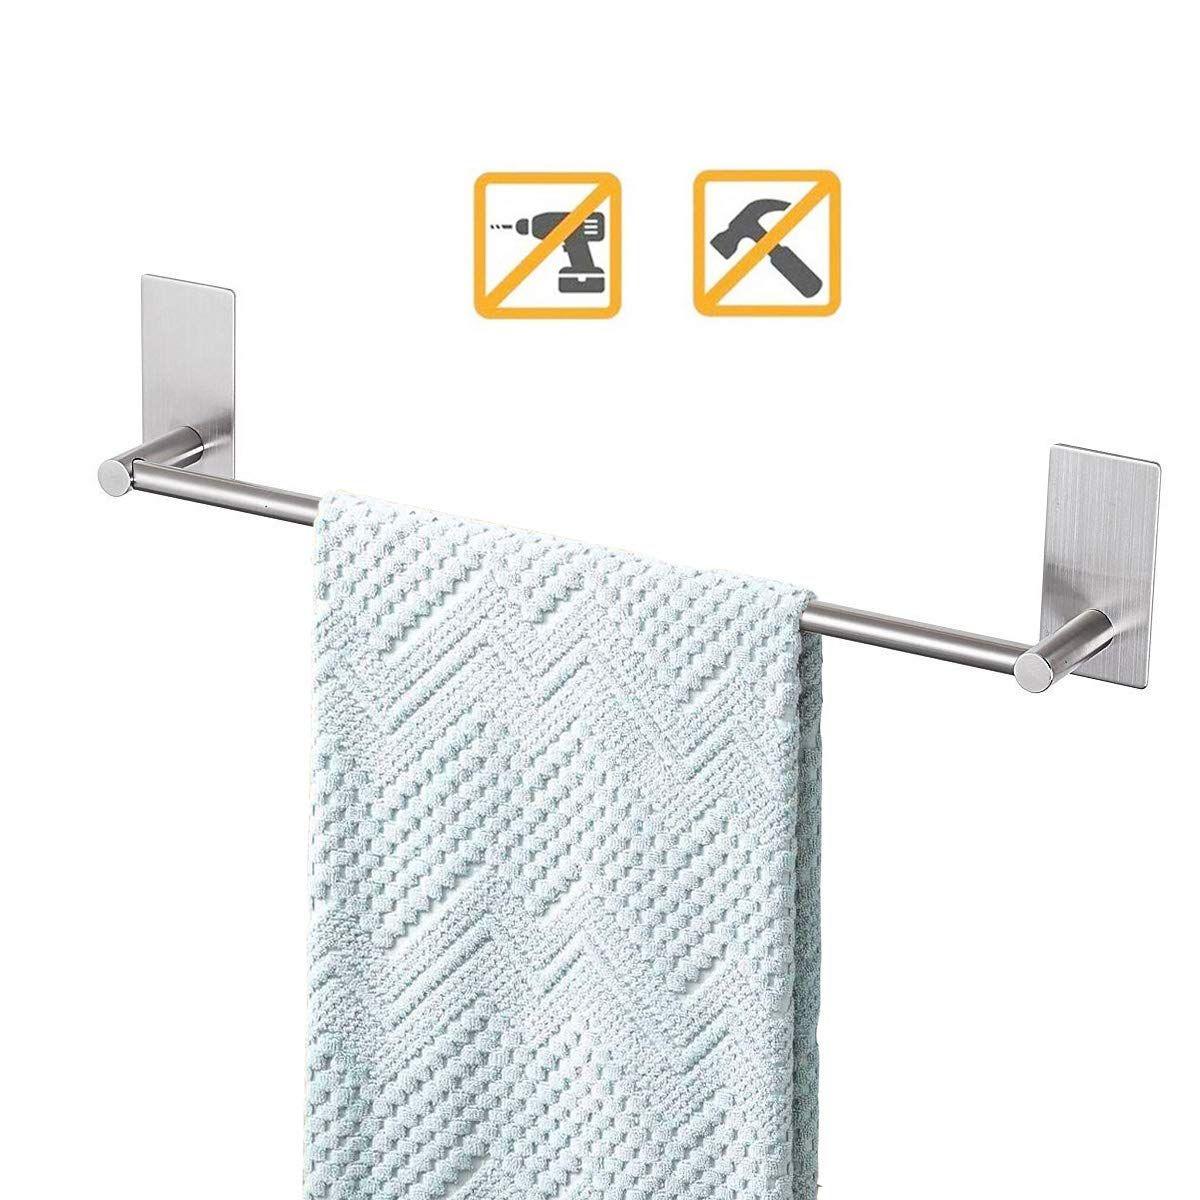 Bathroom Towel Bar 16inch Easy Install With Self Adhesive No Drilling On Walls Towel Bar Bathroom Towel Bar Towel Rack